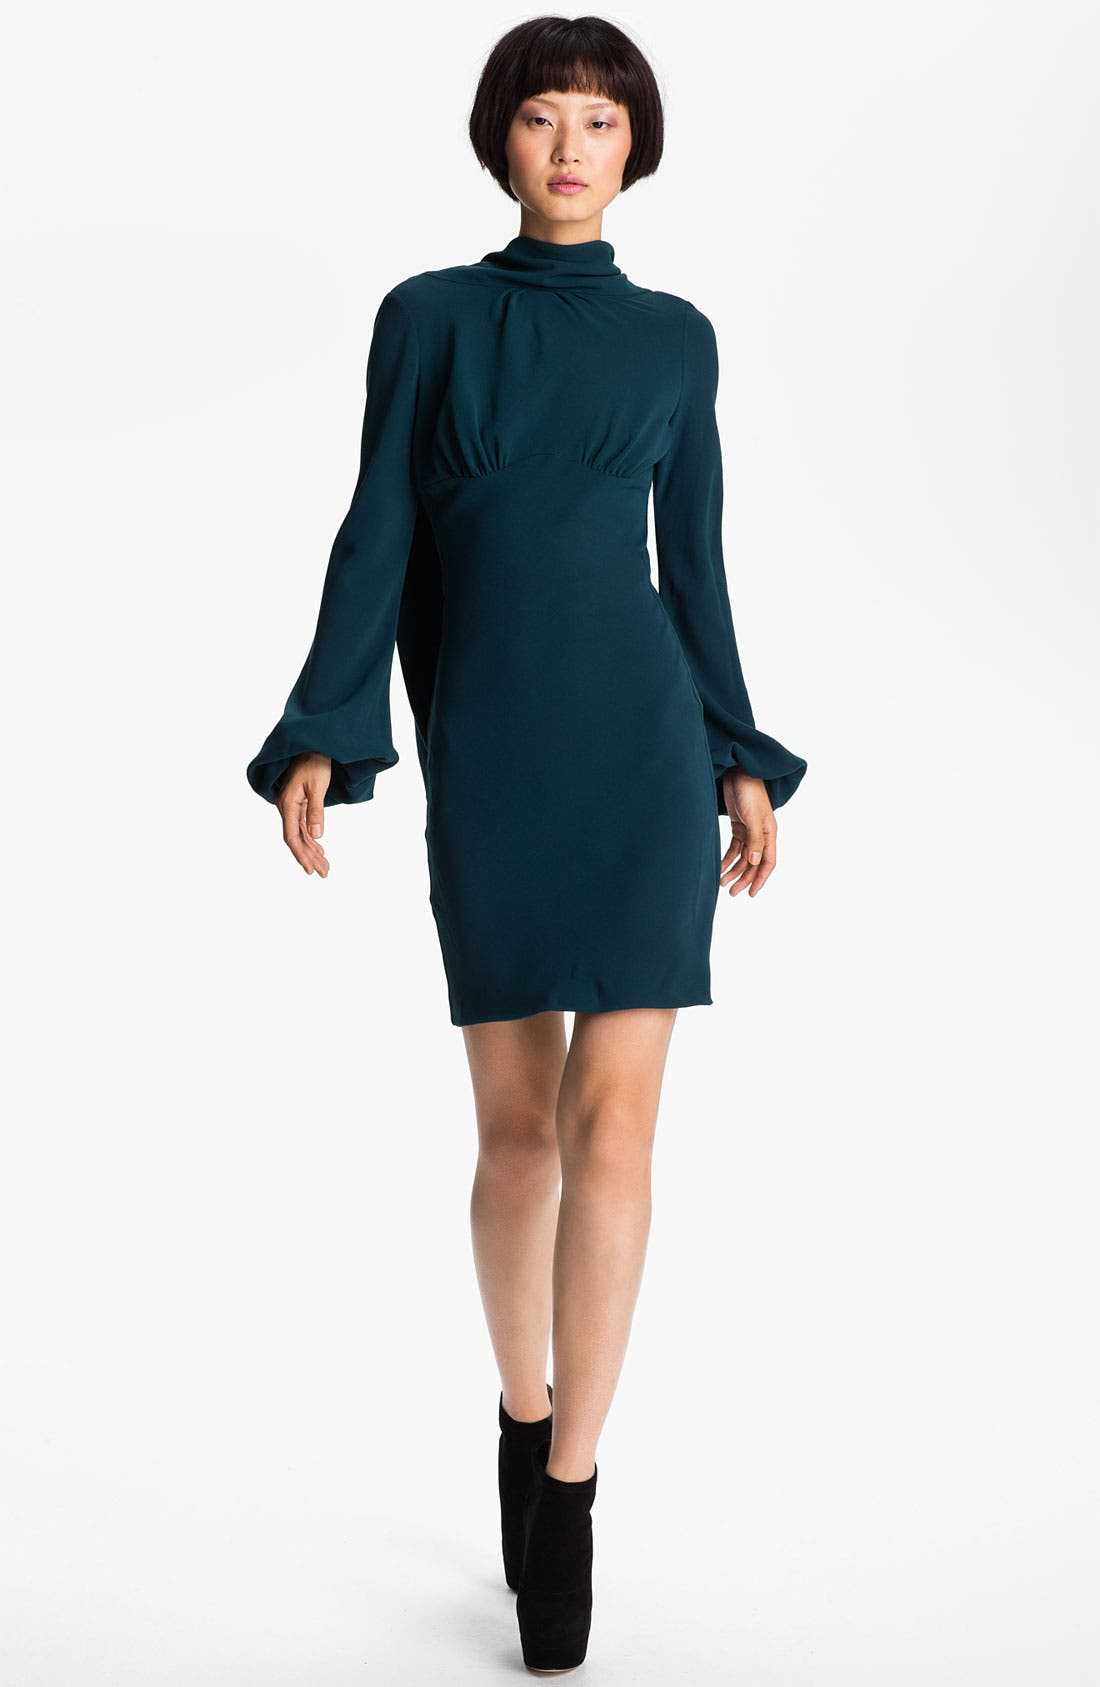 Alternate Image 1 Selected - Skaist-Taylor 'Laura' Drape Back Crepe Dress